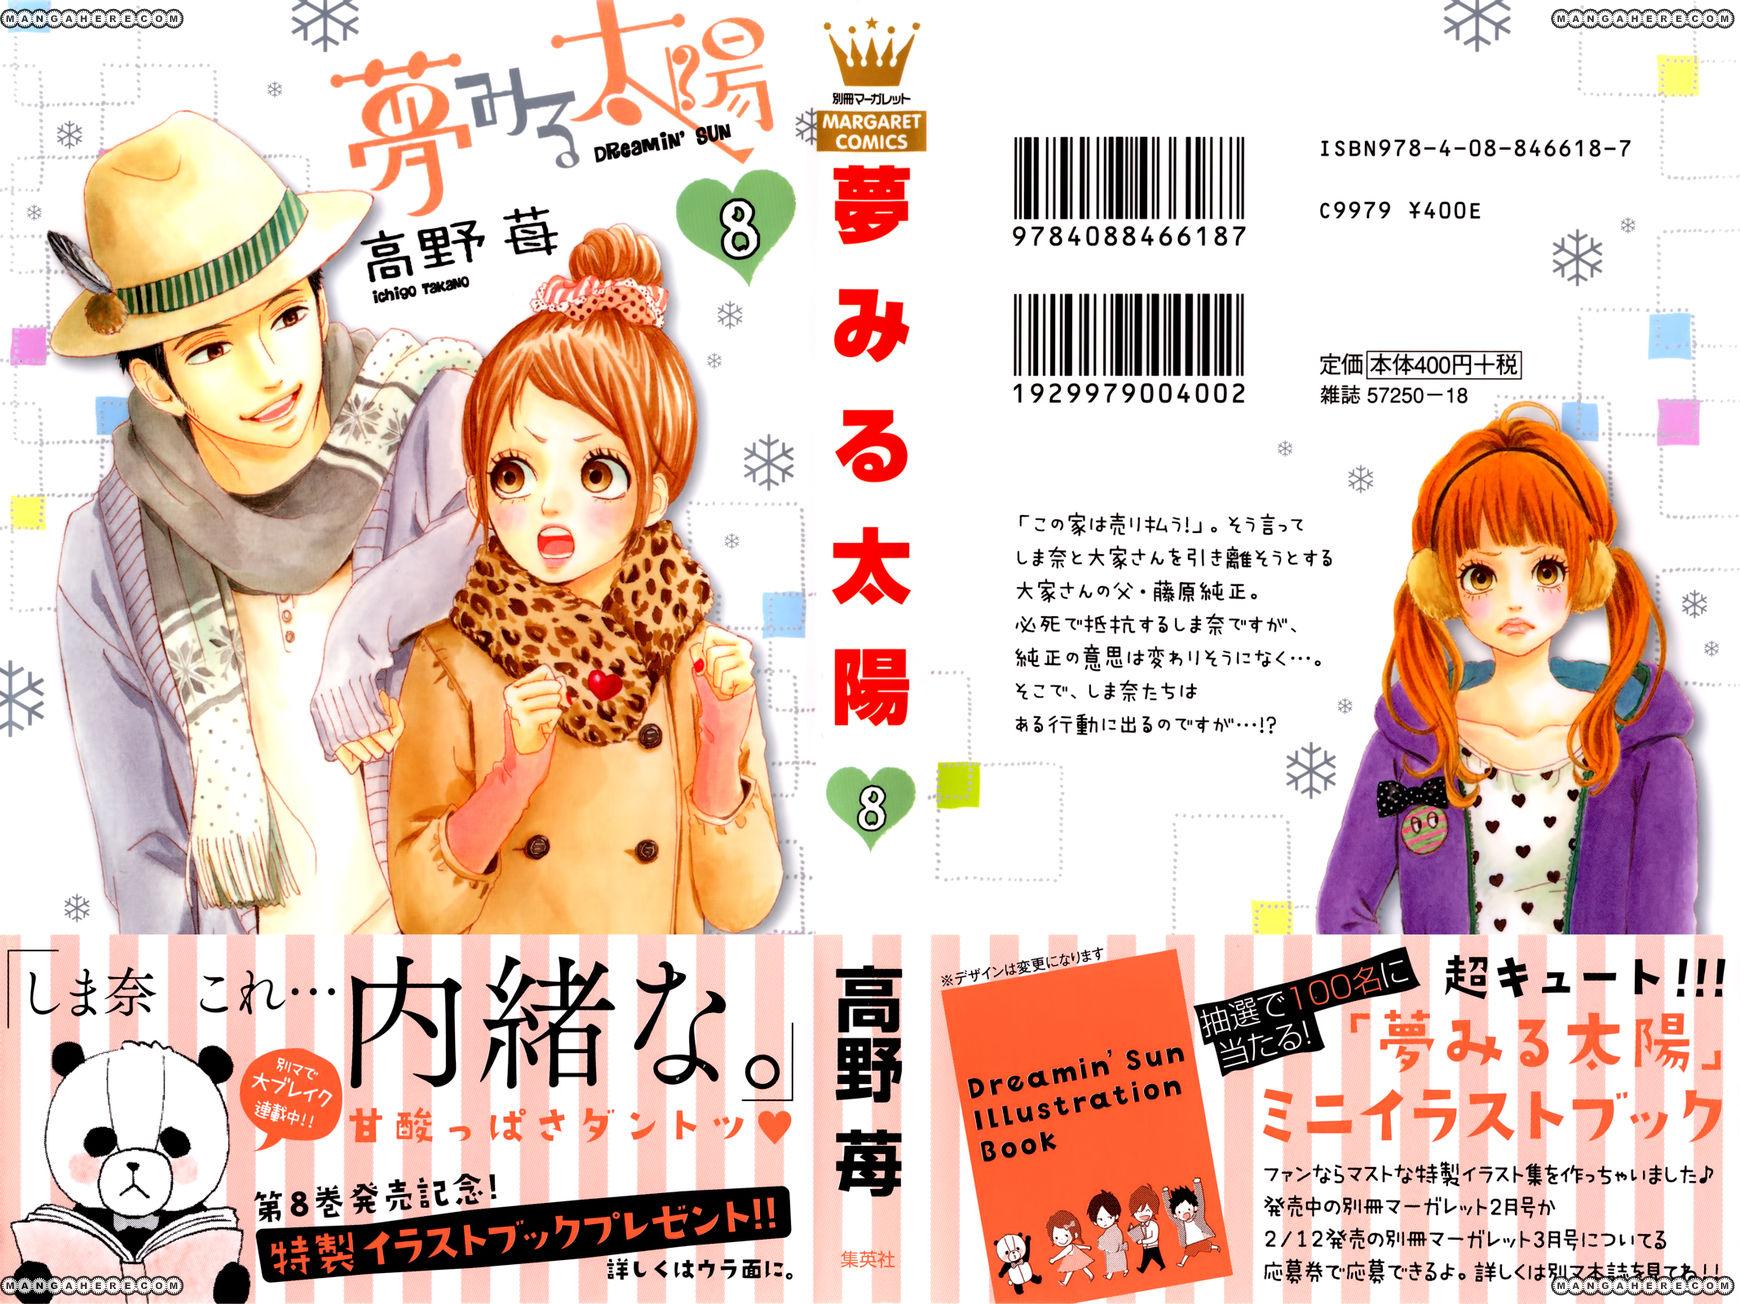 Yumemiru Taiyou 33 Page 2